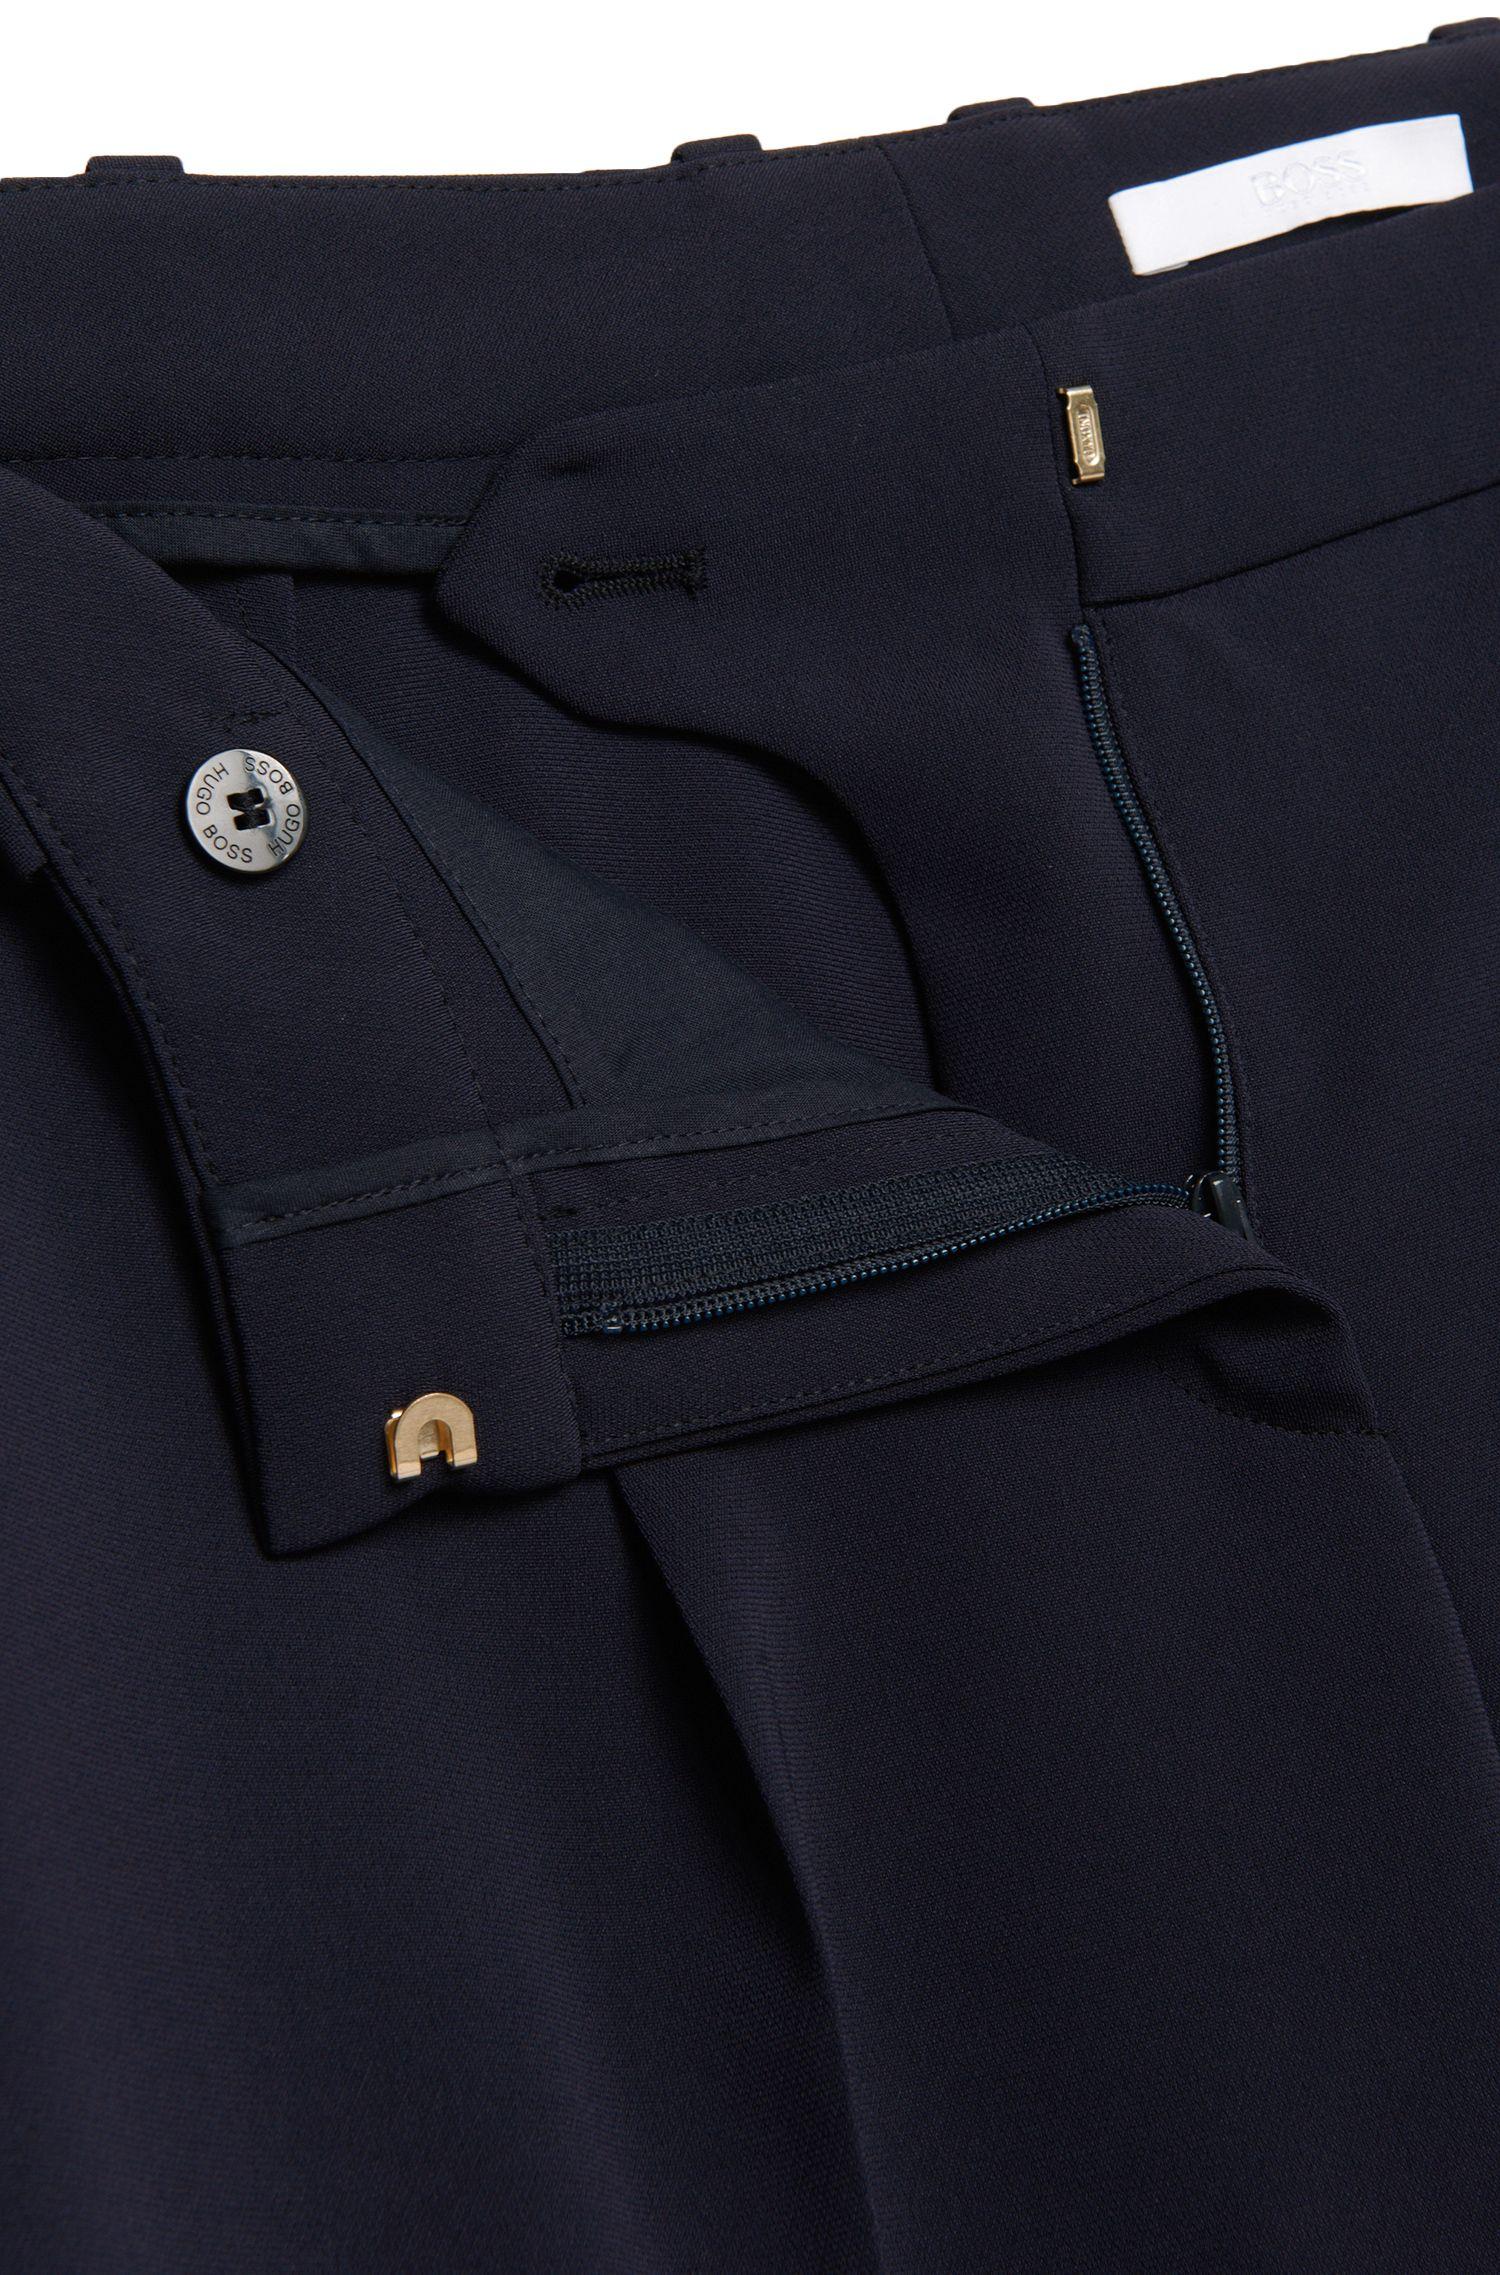 Regular-Fit Hose in Cropped-Länge: 'Tobaluka6'